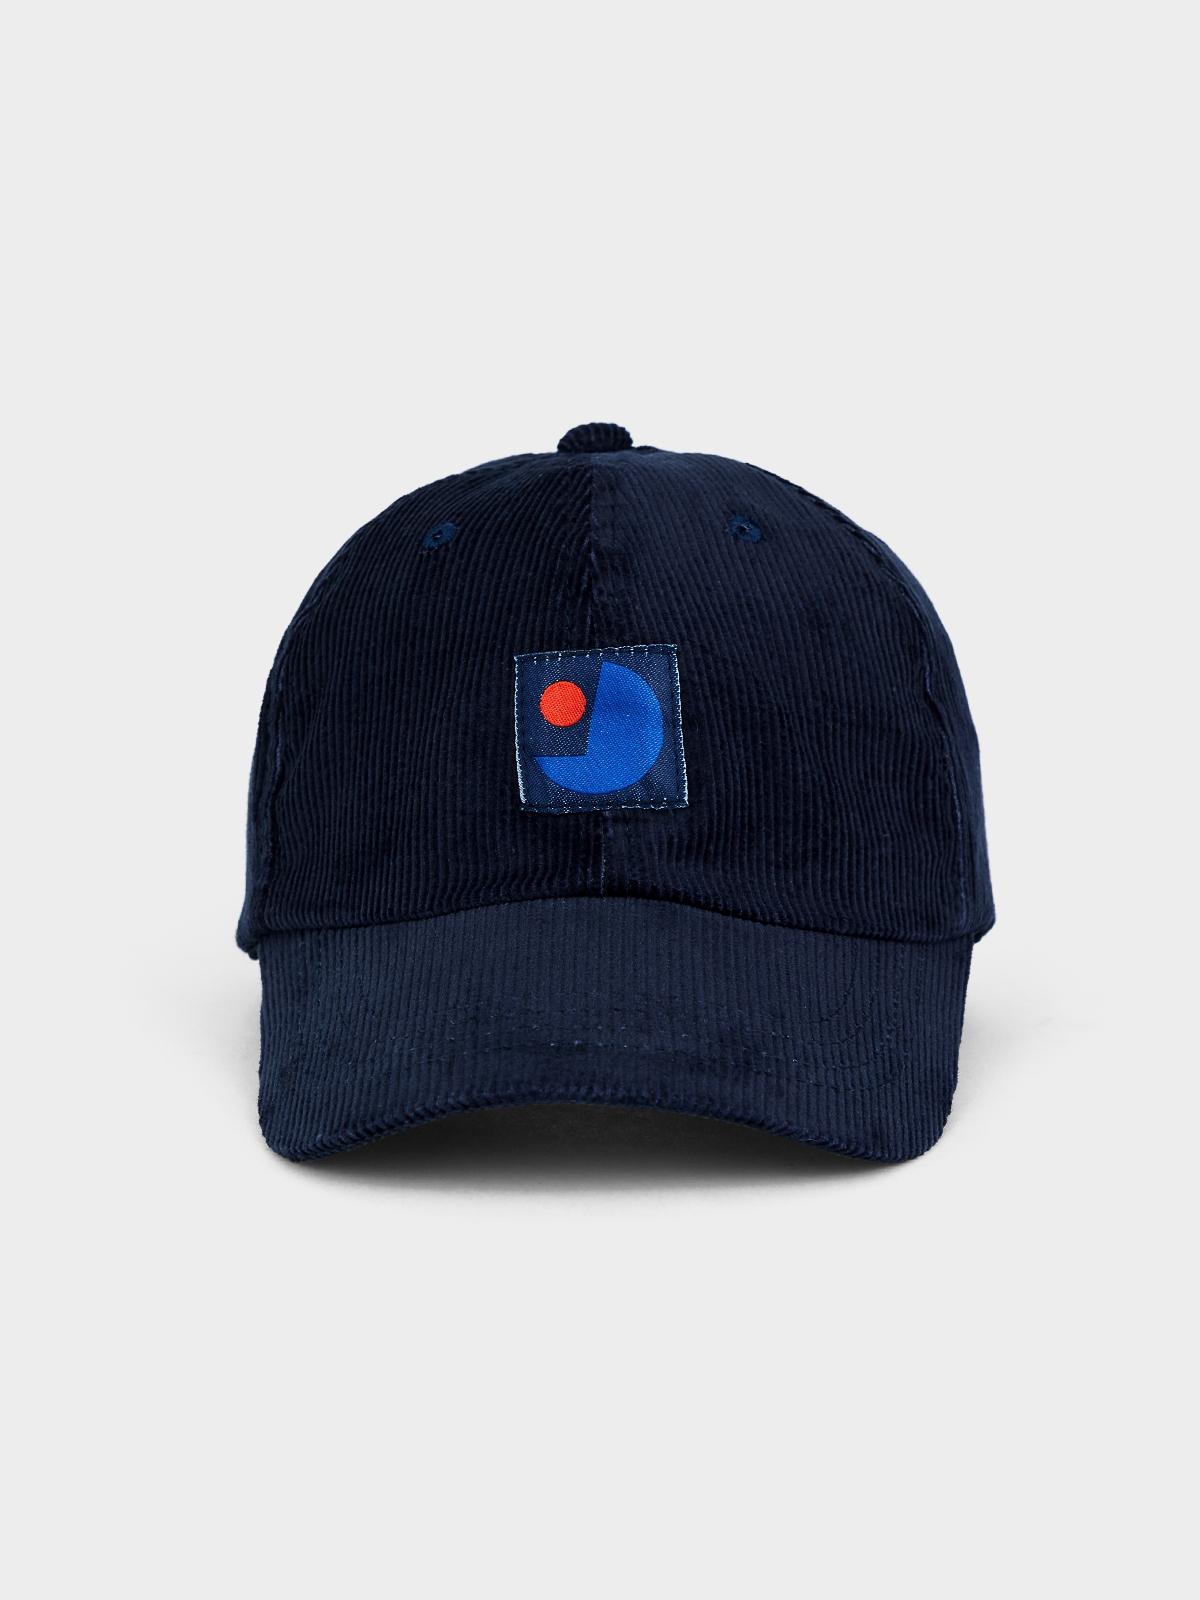 Japfac Cozy Cap Navy